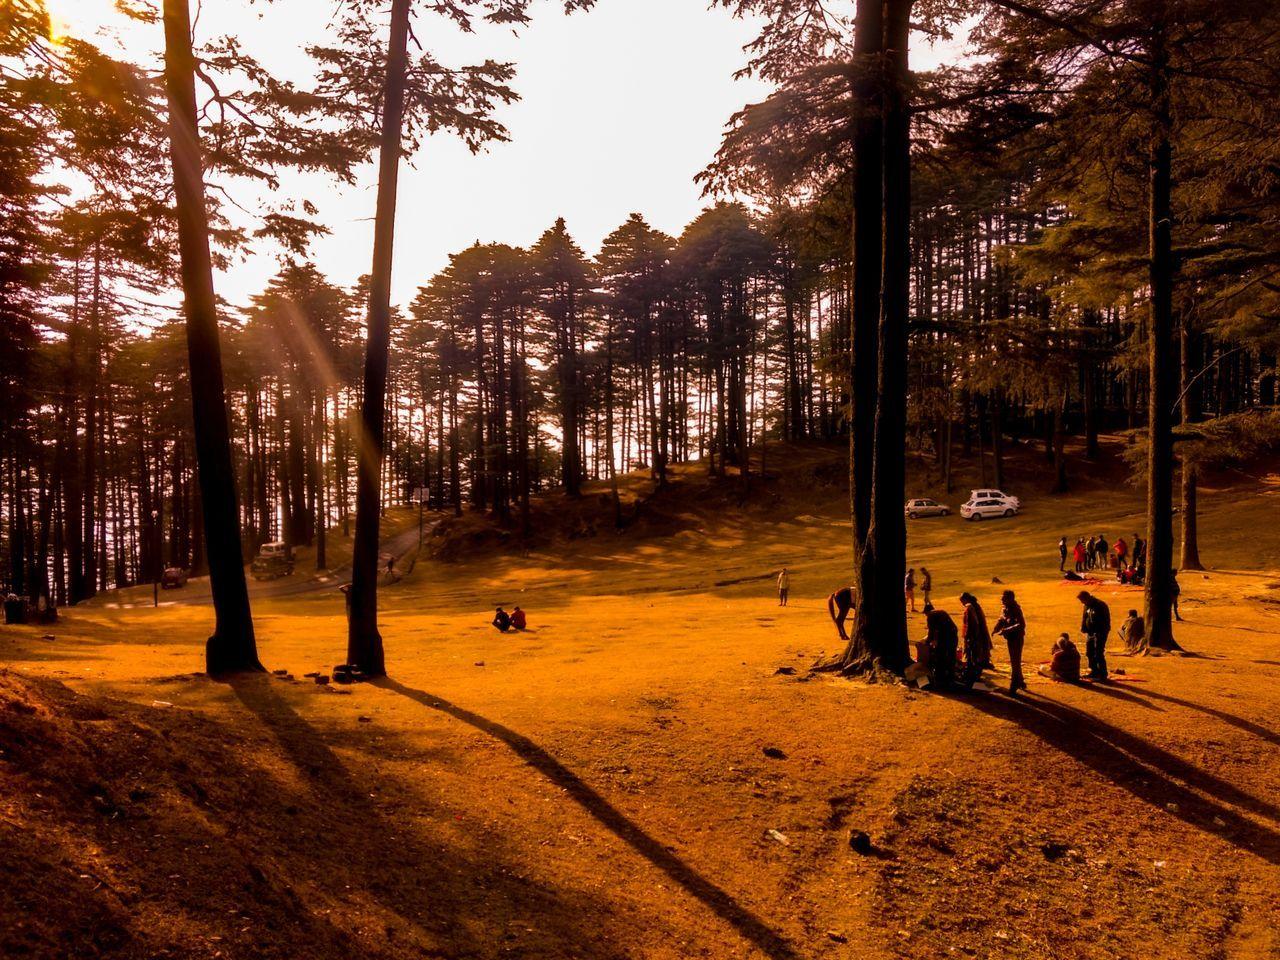 EyeEmNewHere Patnitop. Sunset Tree Sunlight Nature Outdoors Sky Large Group Of People Day People Udhampur Landscape Patnitop Nathatop Mountain Jammu Kashmir Nature Mobilephotography JammuandKashmir Motog4plus Indian Sun Sunlight The Great Outdoors - 2017 EyeEm Awards